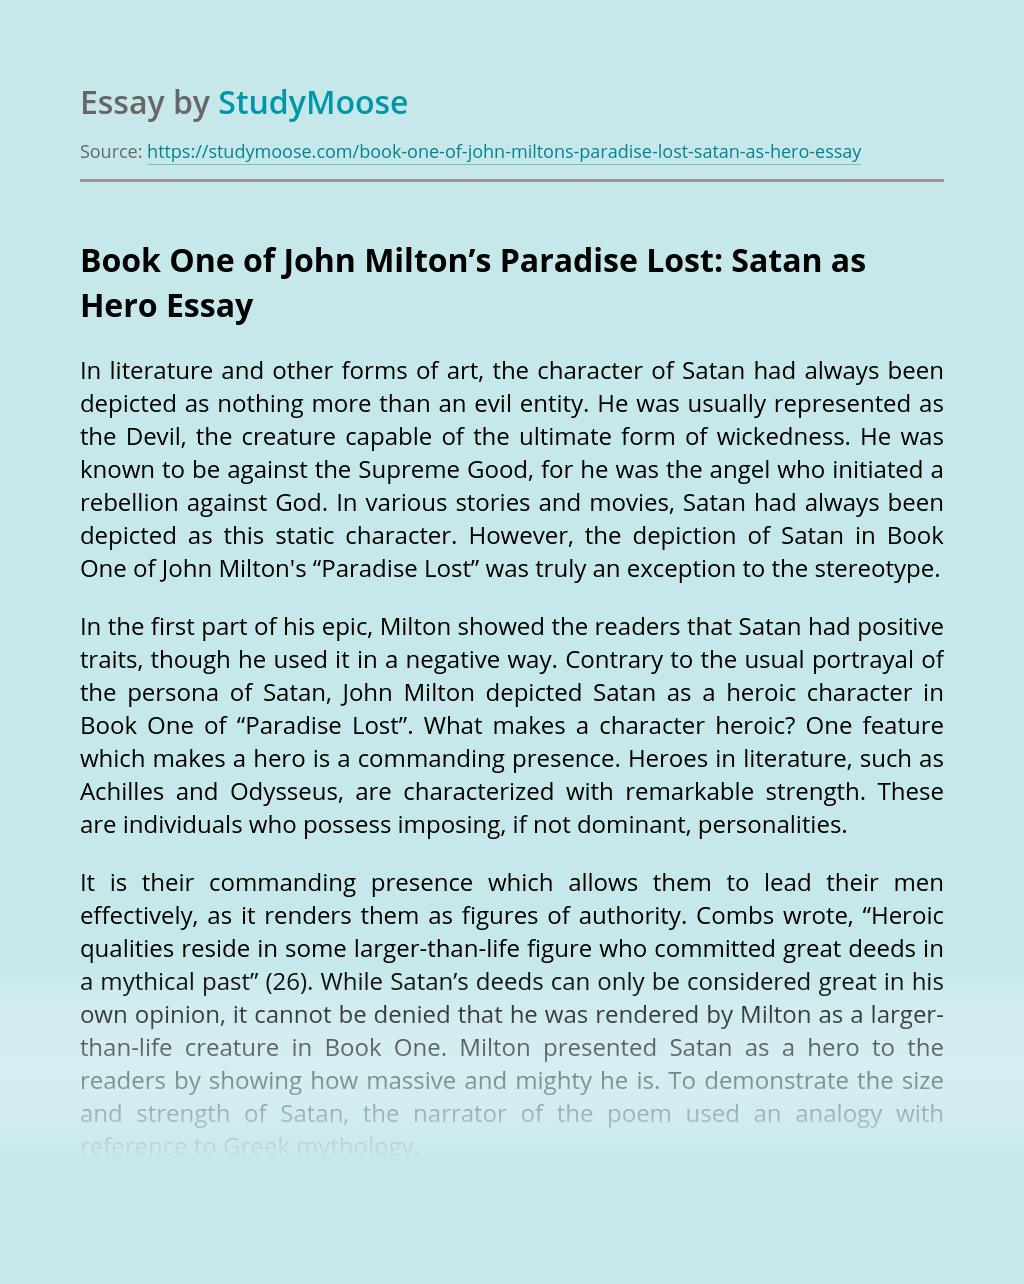 Book One of John Milton's Paradise Lost: Satan as Hero